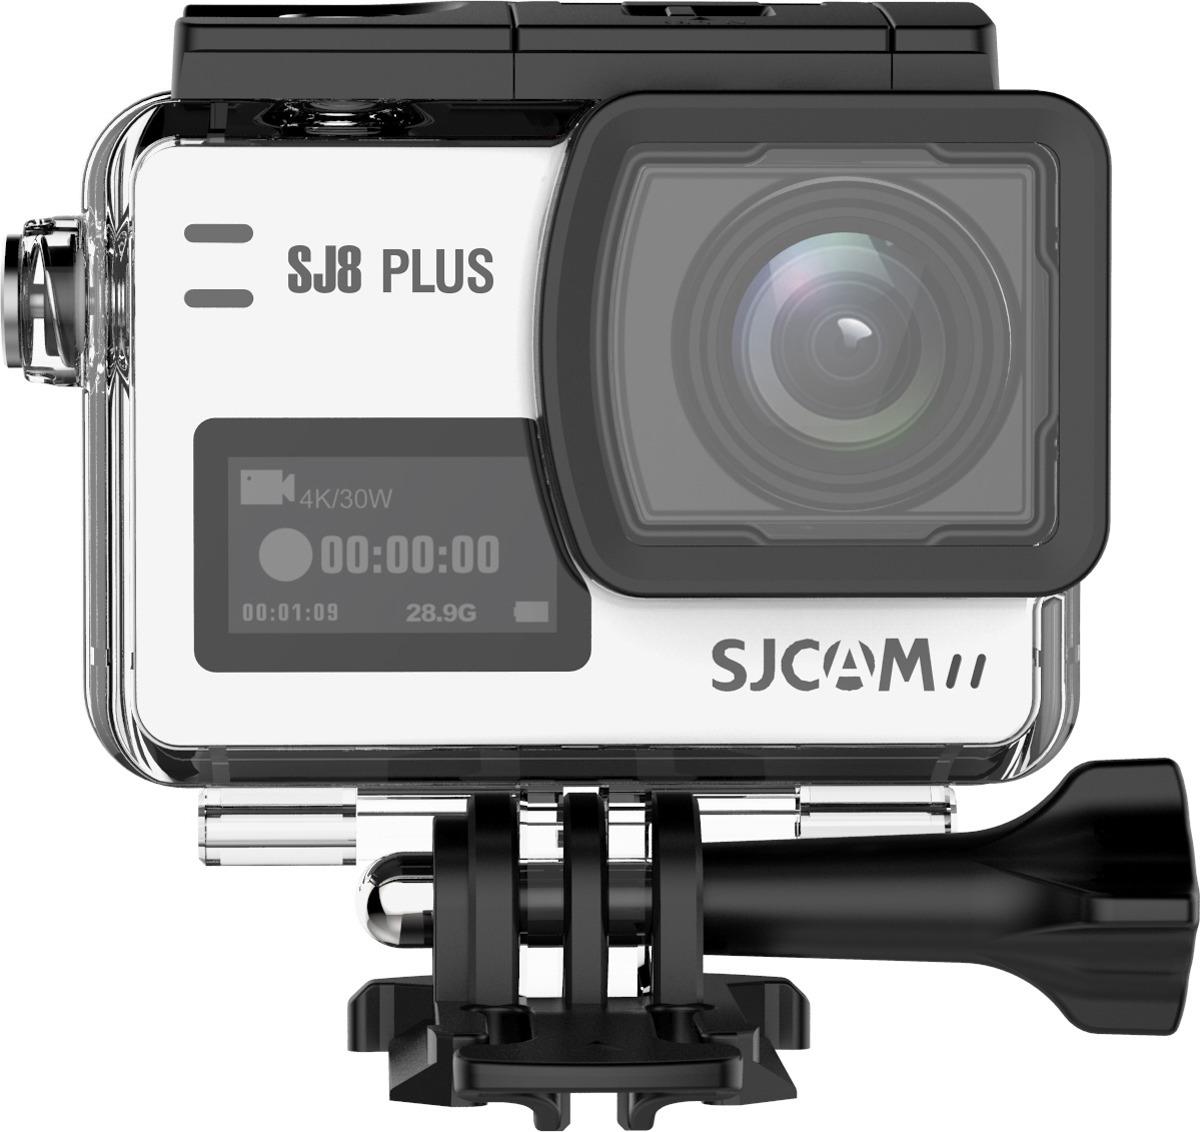 Экшн-камера SJCAM SJ8 Plus, SJ8 Plus (white), серебристый original sjcam sj8 pro 4k 60fps wifi action camera